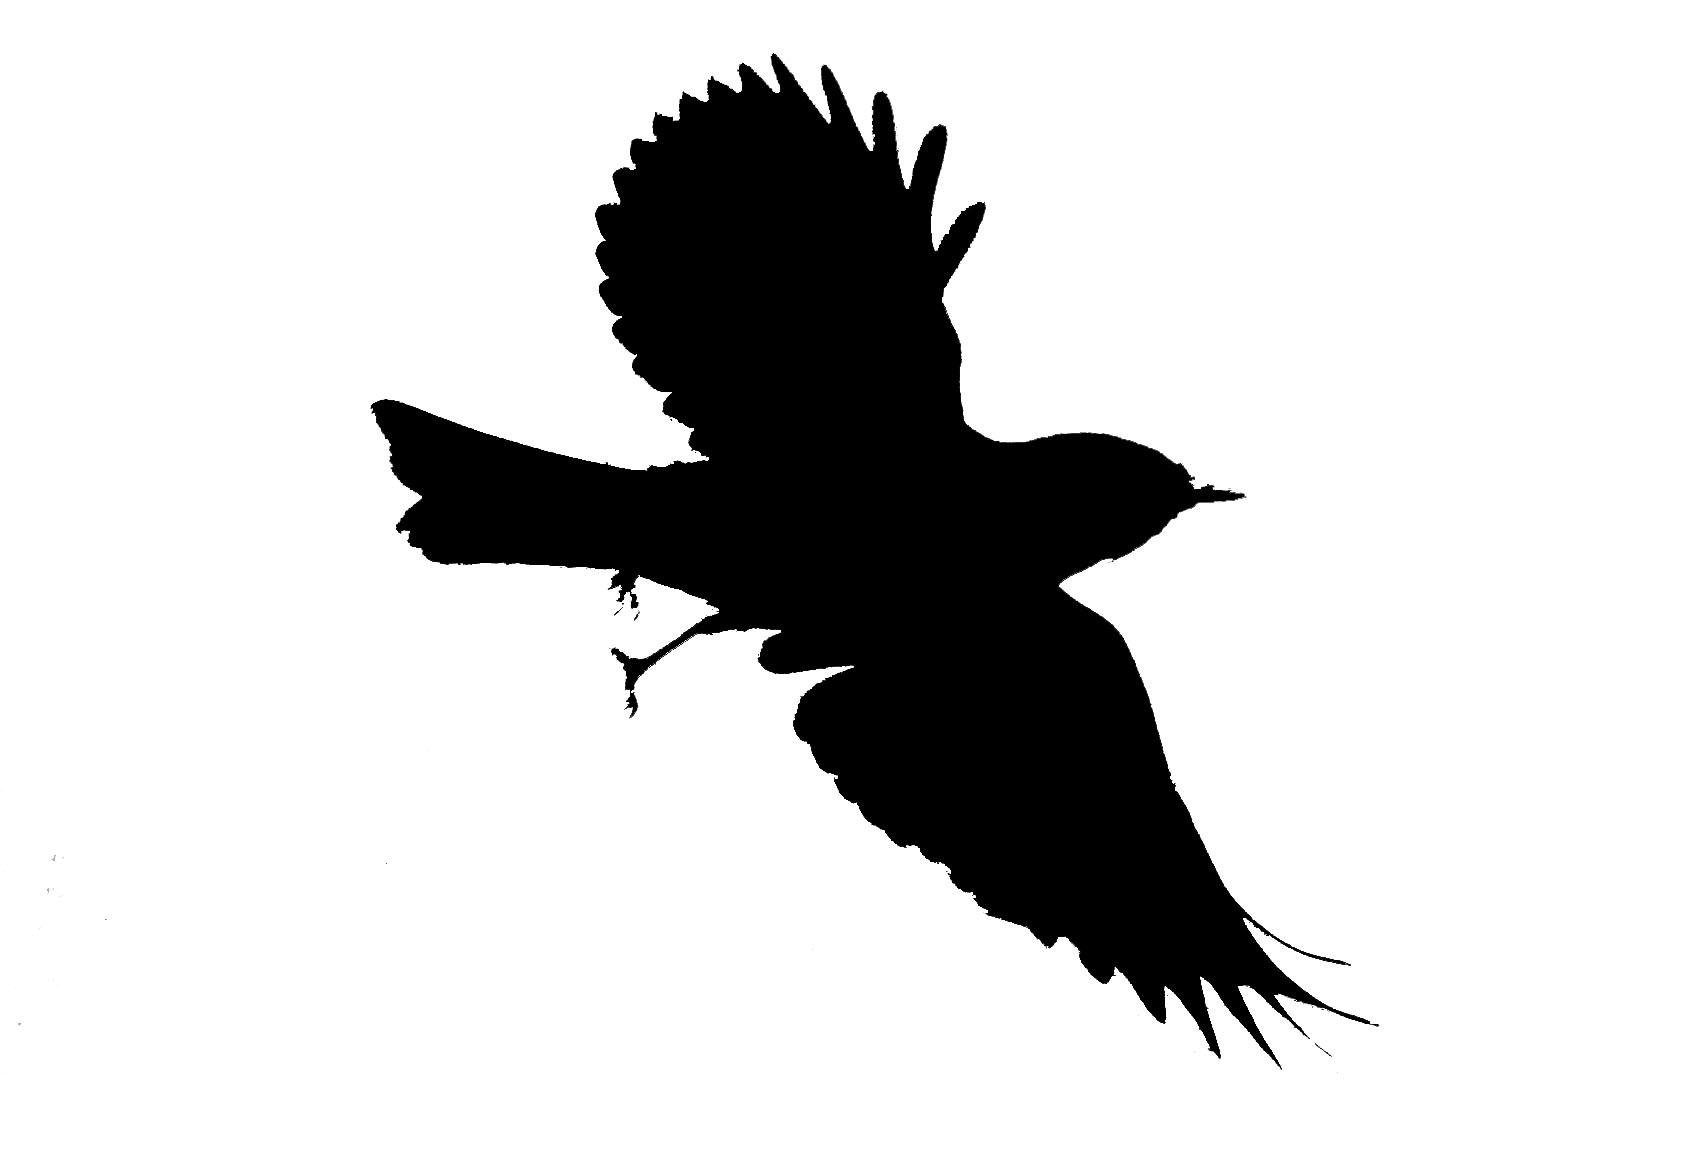 Blackbird clipart mockingbird Clipart Free mockingbird%20clipart Images Mockingbird